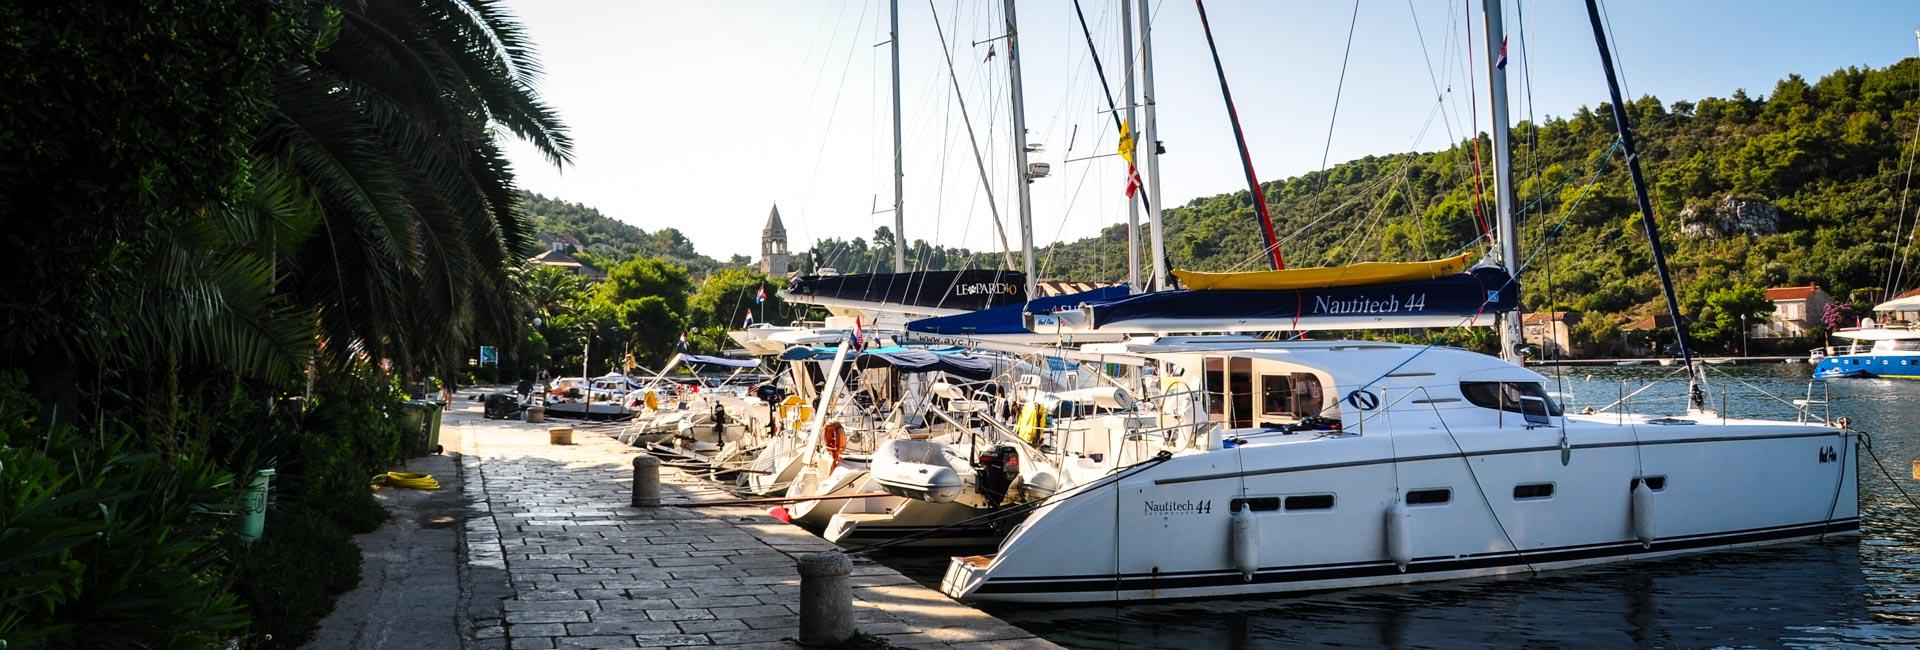 Dubrovnik & Montenegro Sailing